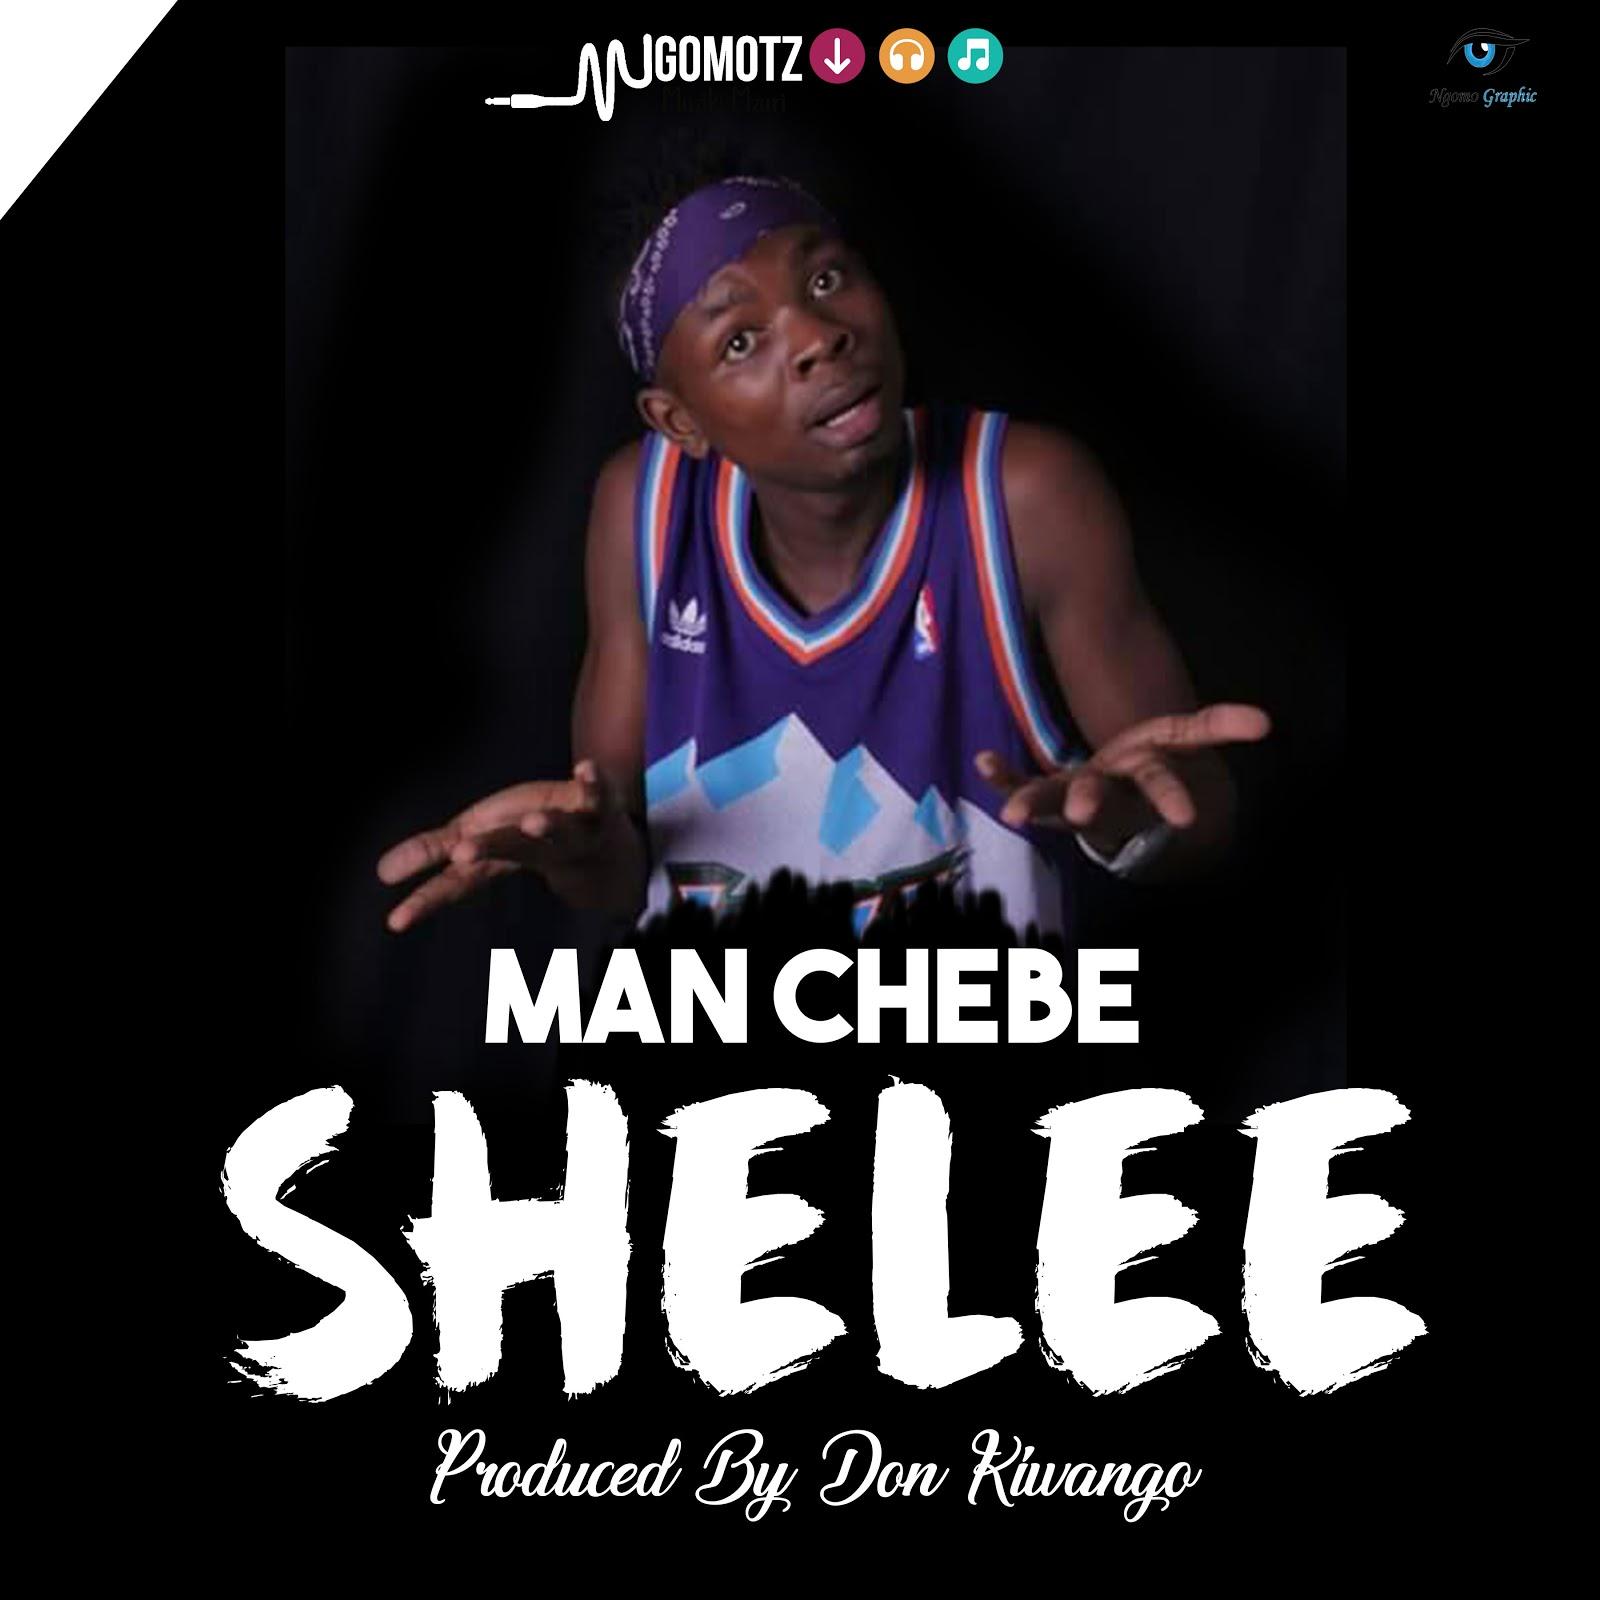 AUDIO | MAN CHEBE - SHELEE (Singeli) | Download - DJ Mwanga